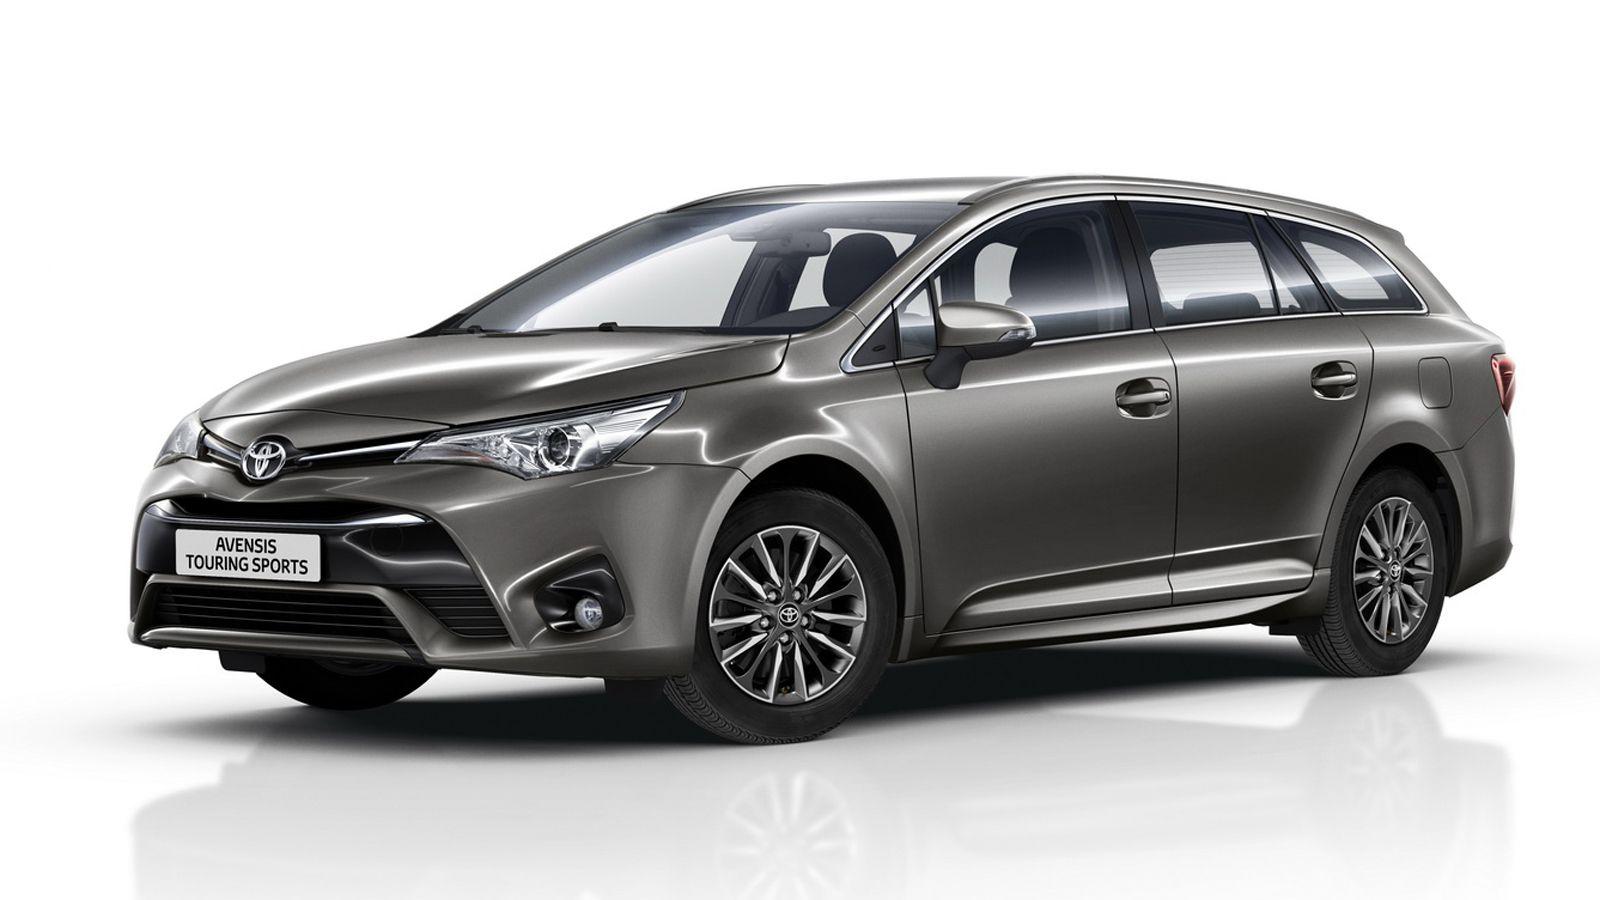 2018 honda accord interior us news world report 2017 2015 toyota ch r hybrid crossover 2015 2016 2017 suv